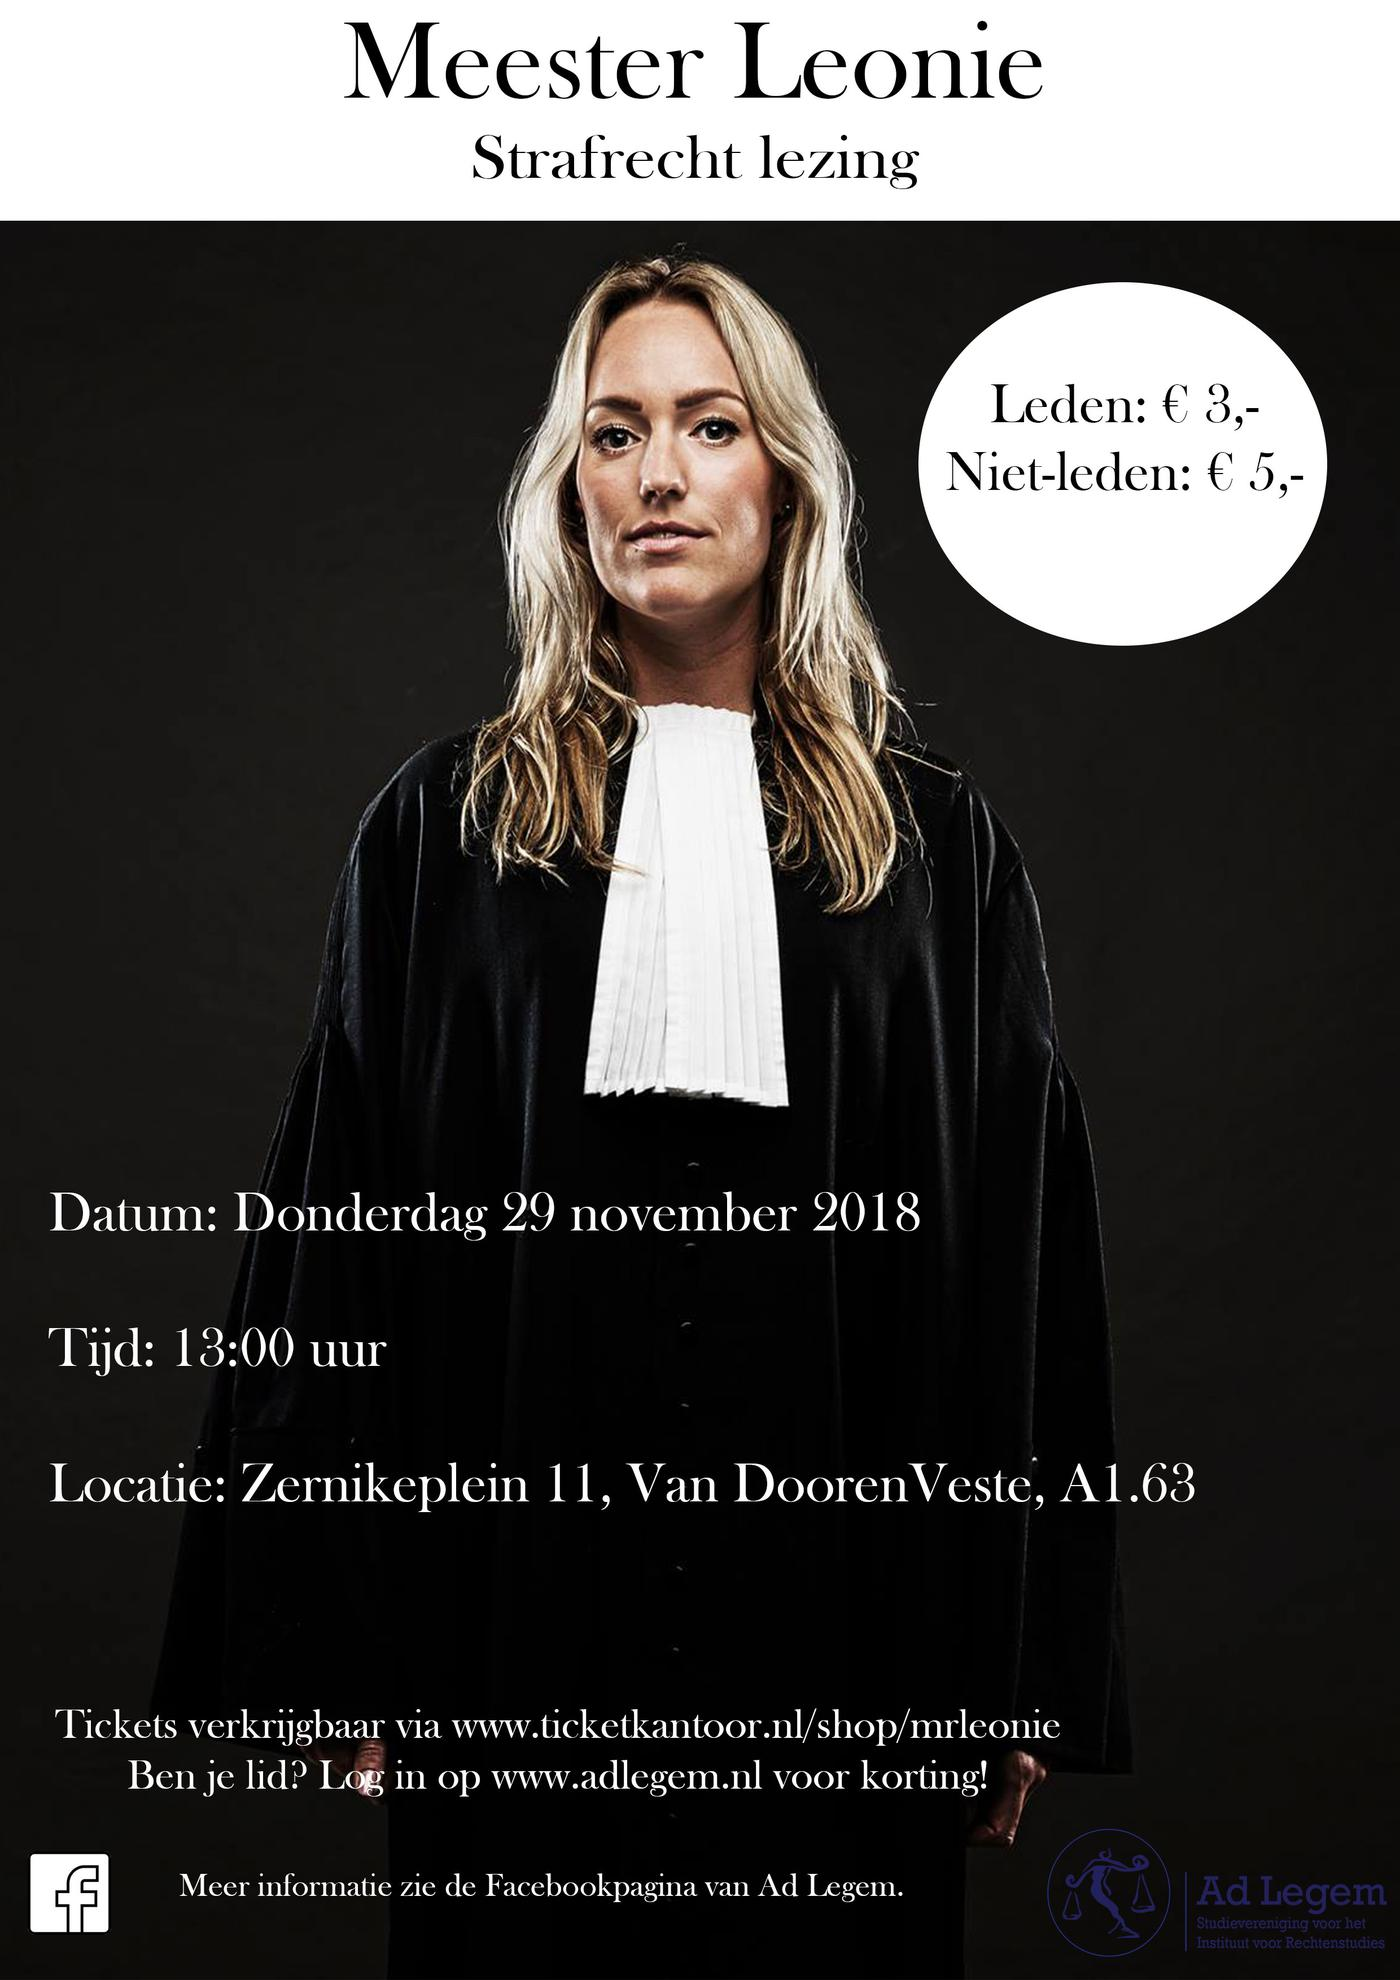 Mr. Leonie - Strafrecht lezing